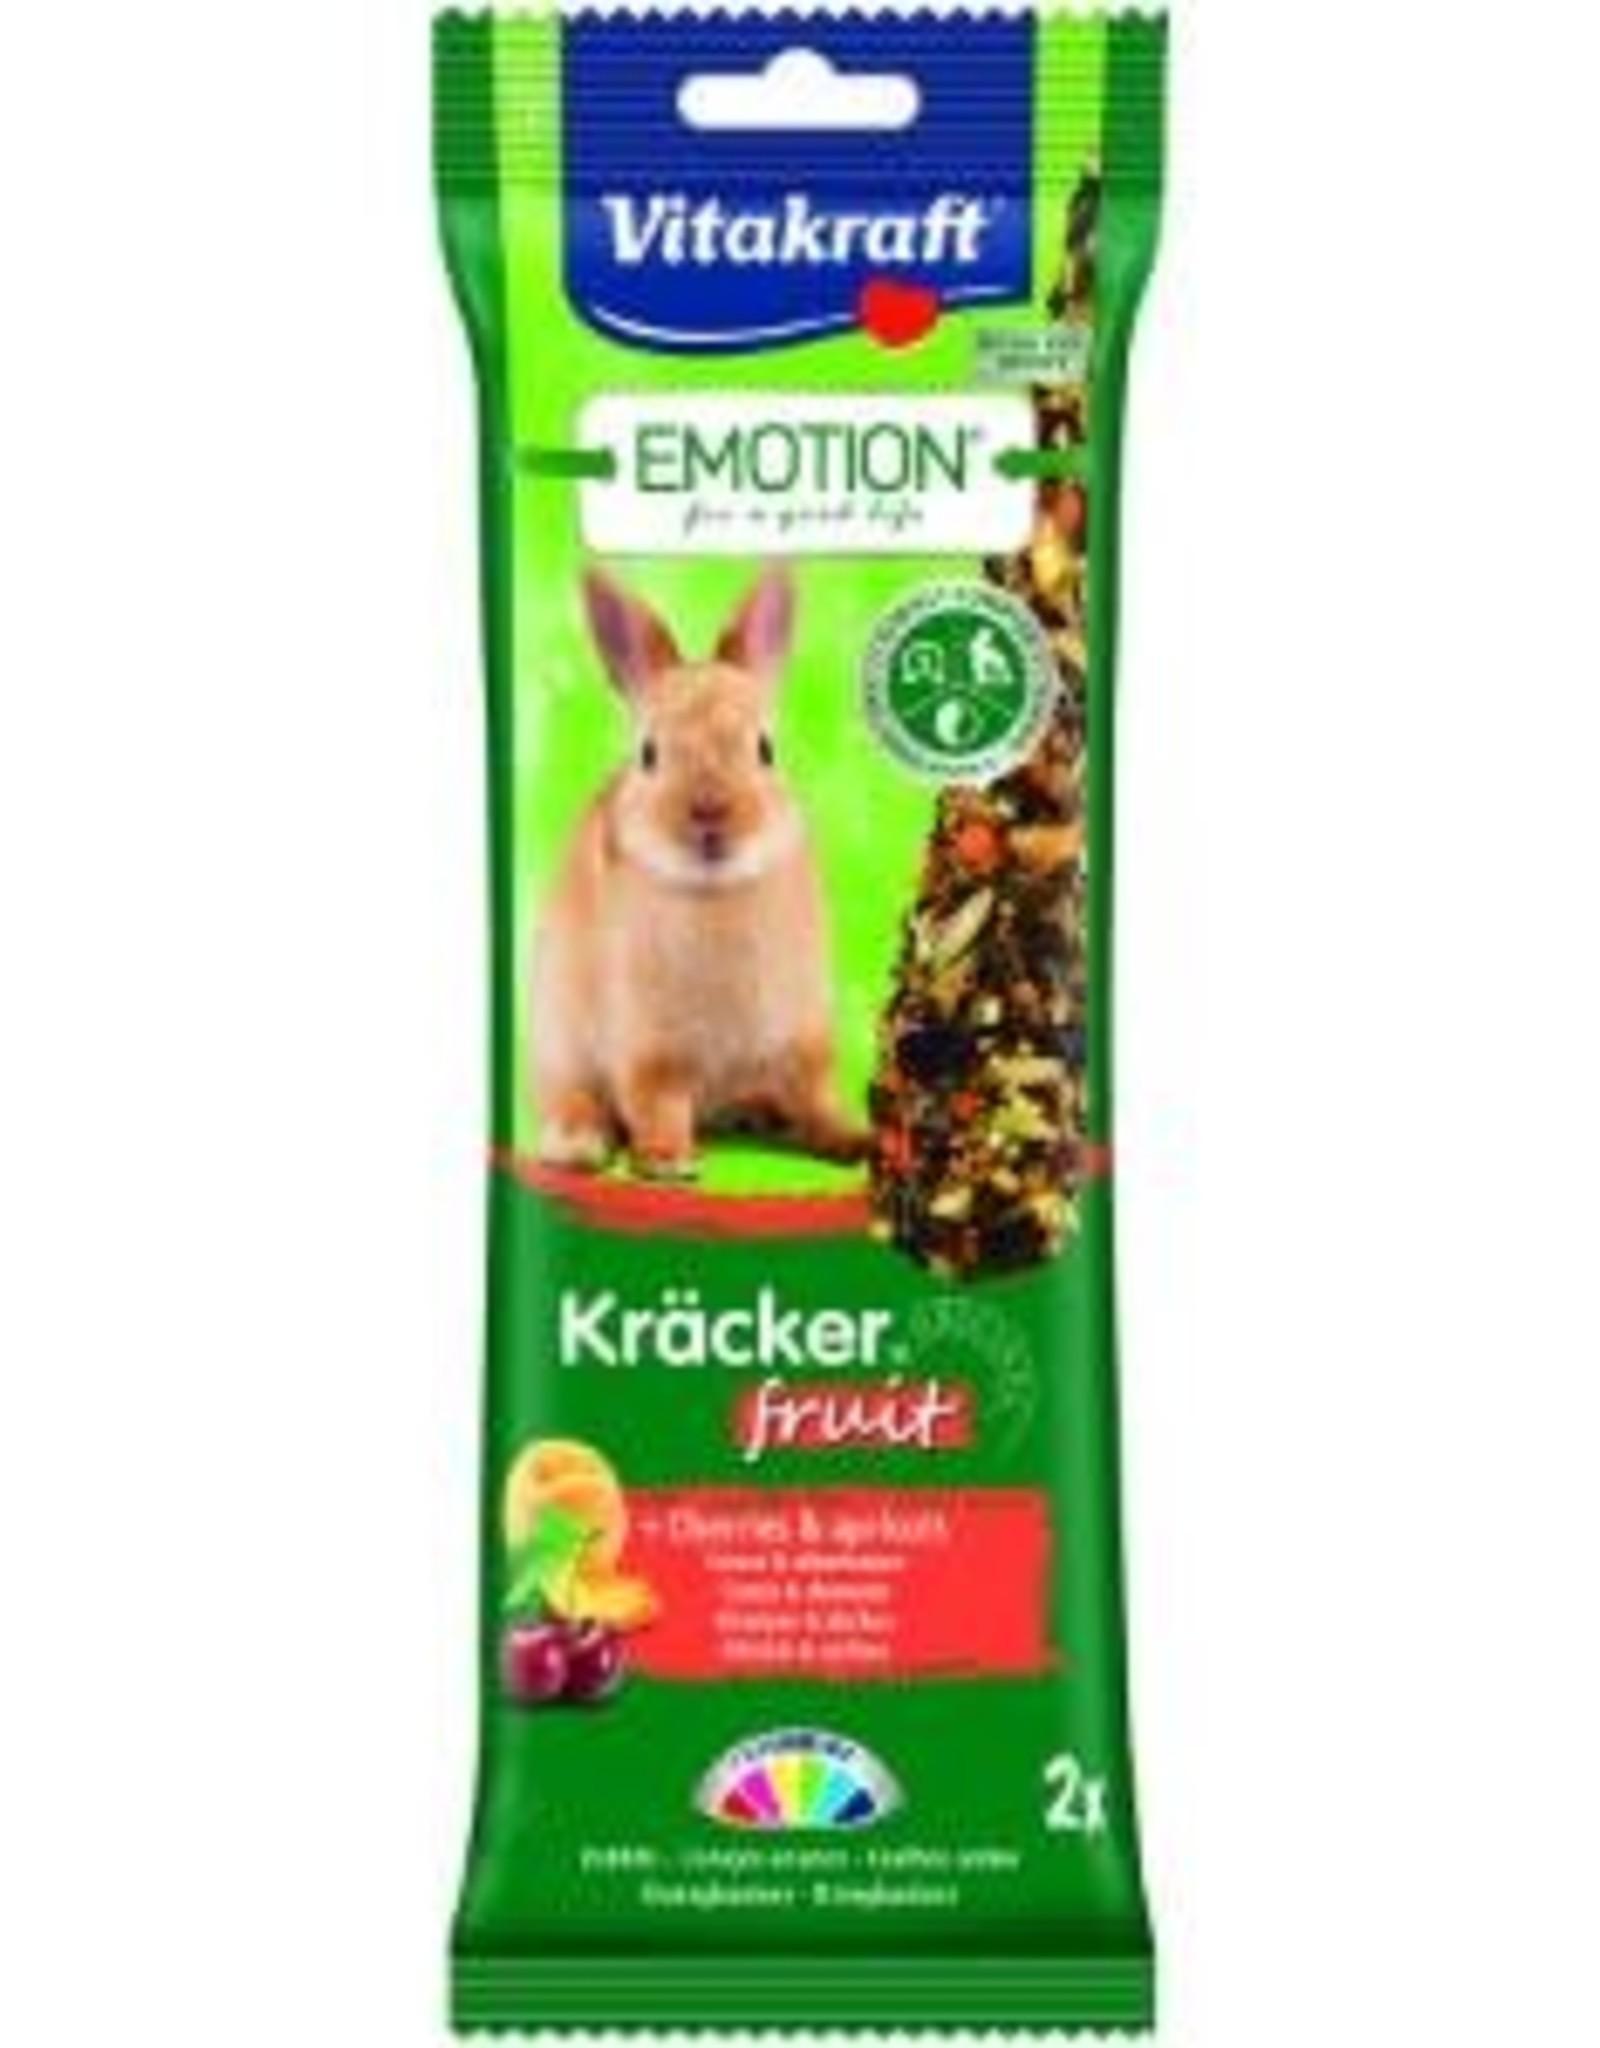 Vitakraft Emotion Rabbit Treats with Fruit, 2 Sticks